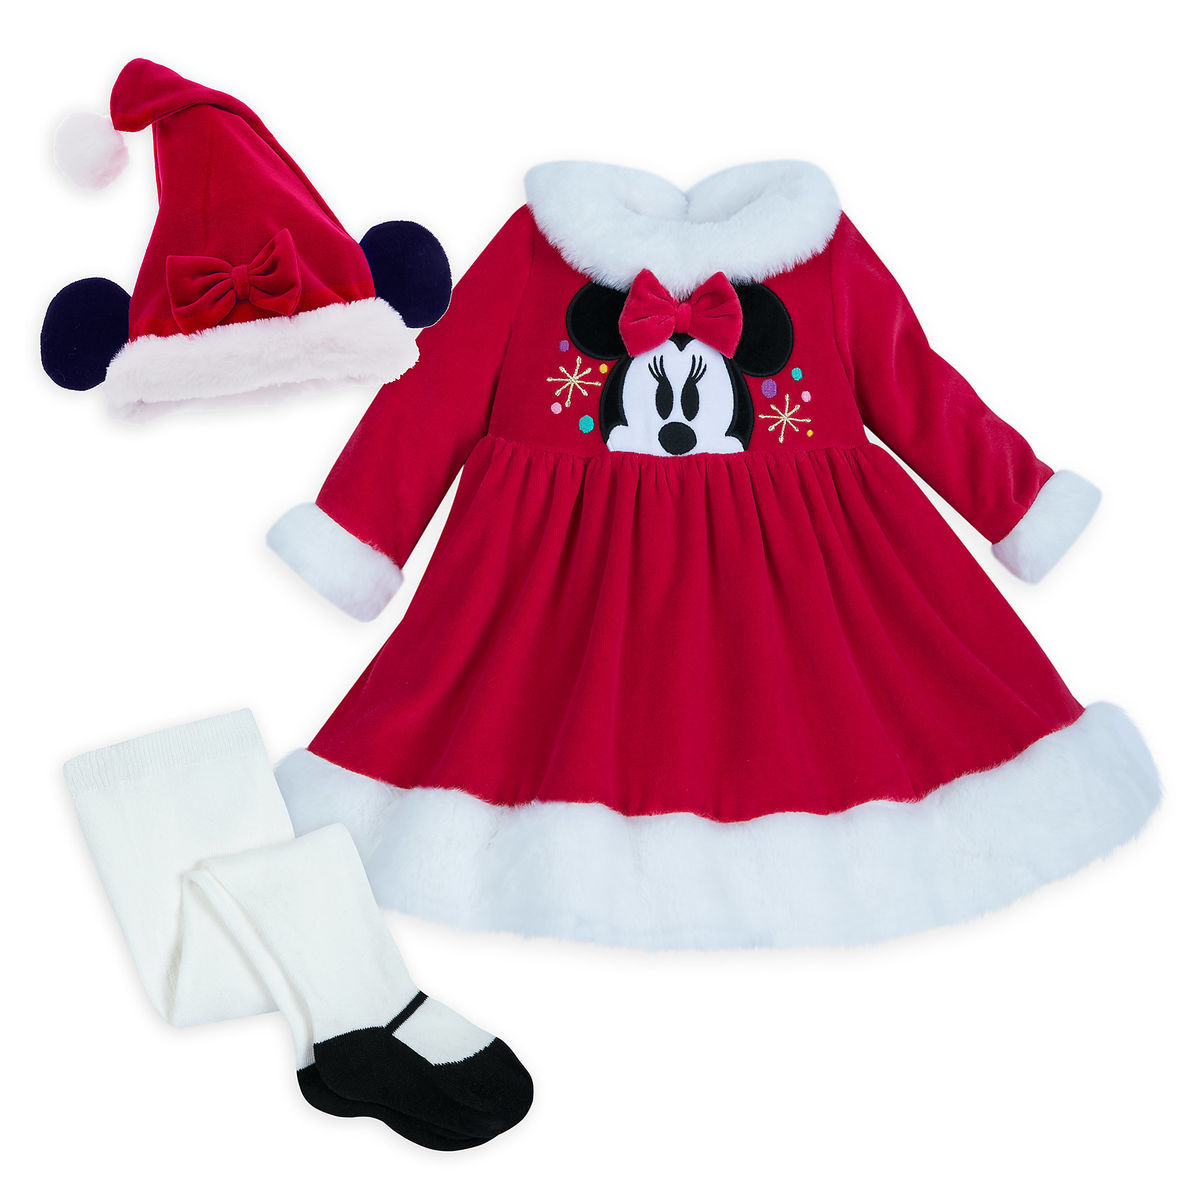 c3e8b522cb25 Santa Minnie Mouse Set for Baby